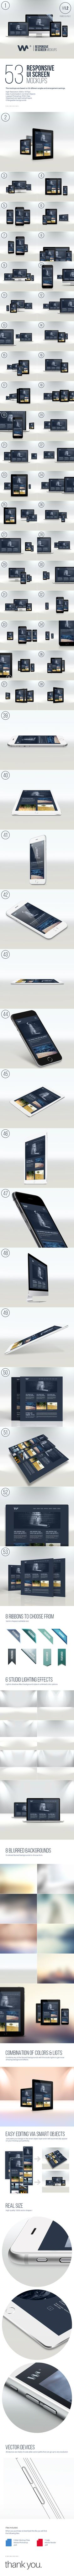 50+ Ui Responsive Website & App Showcase Mockups